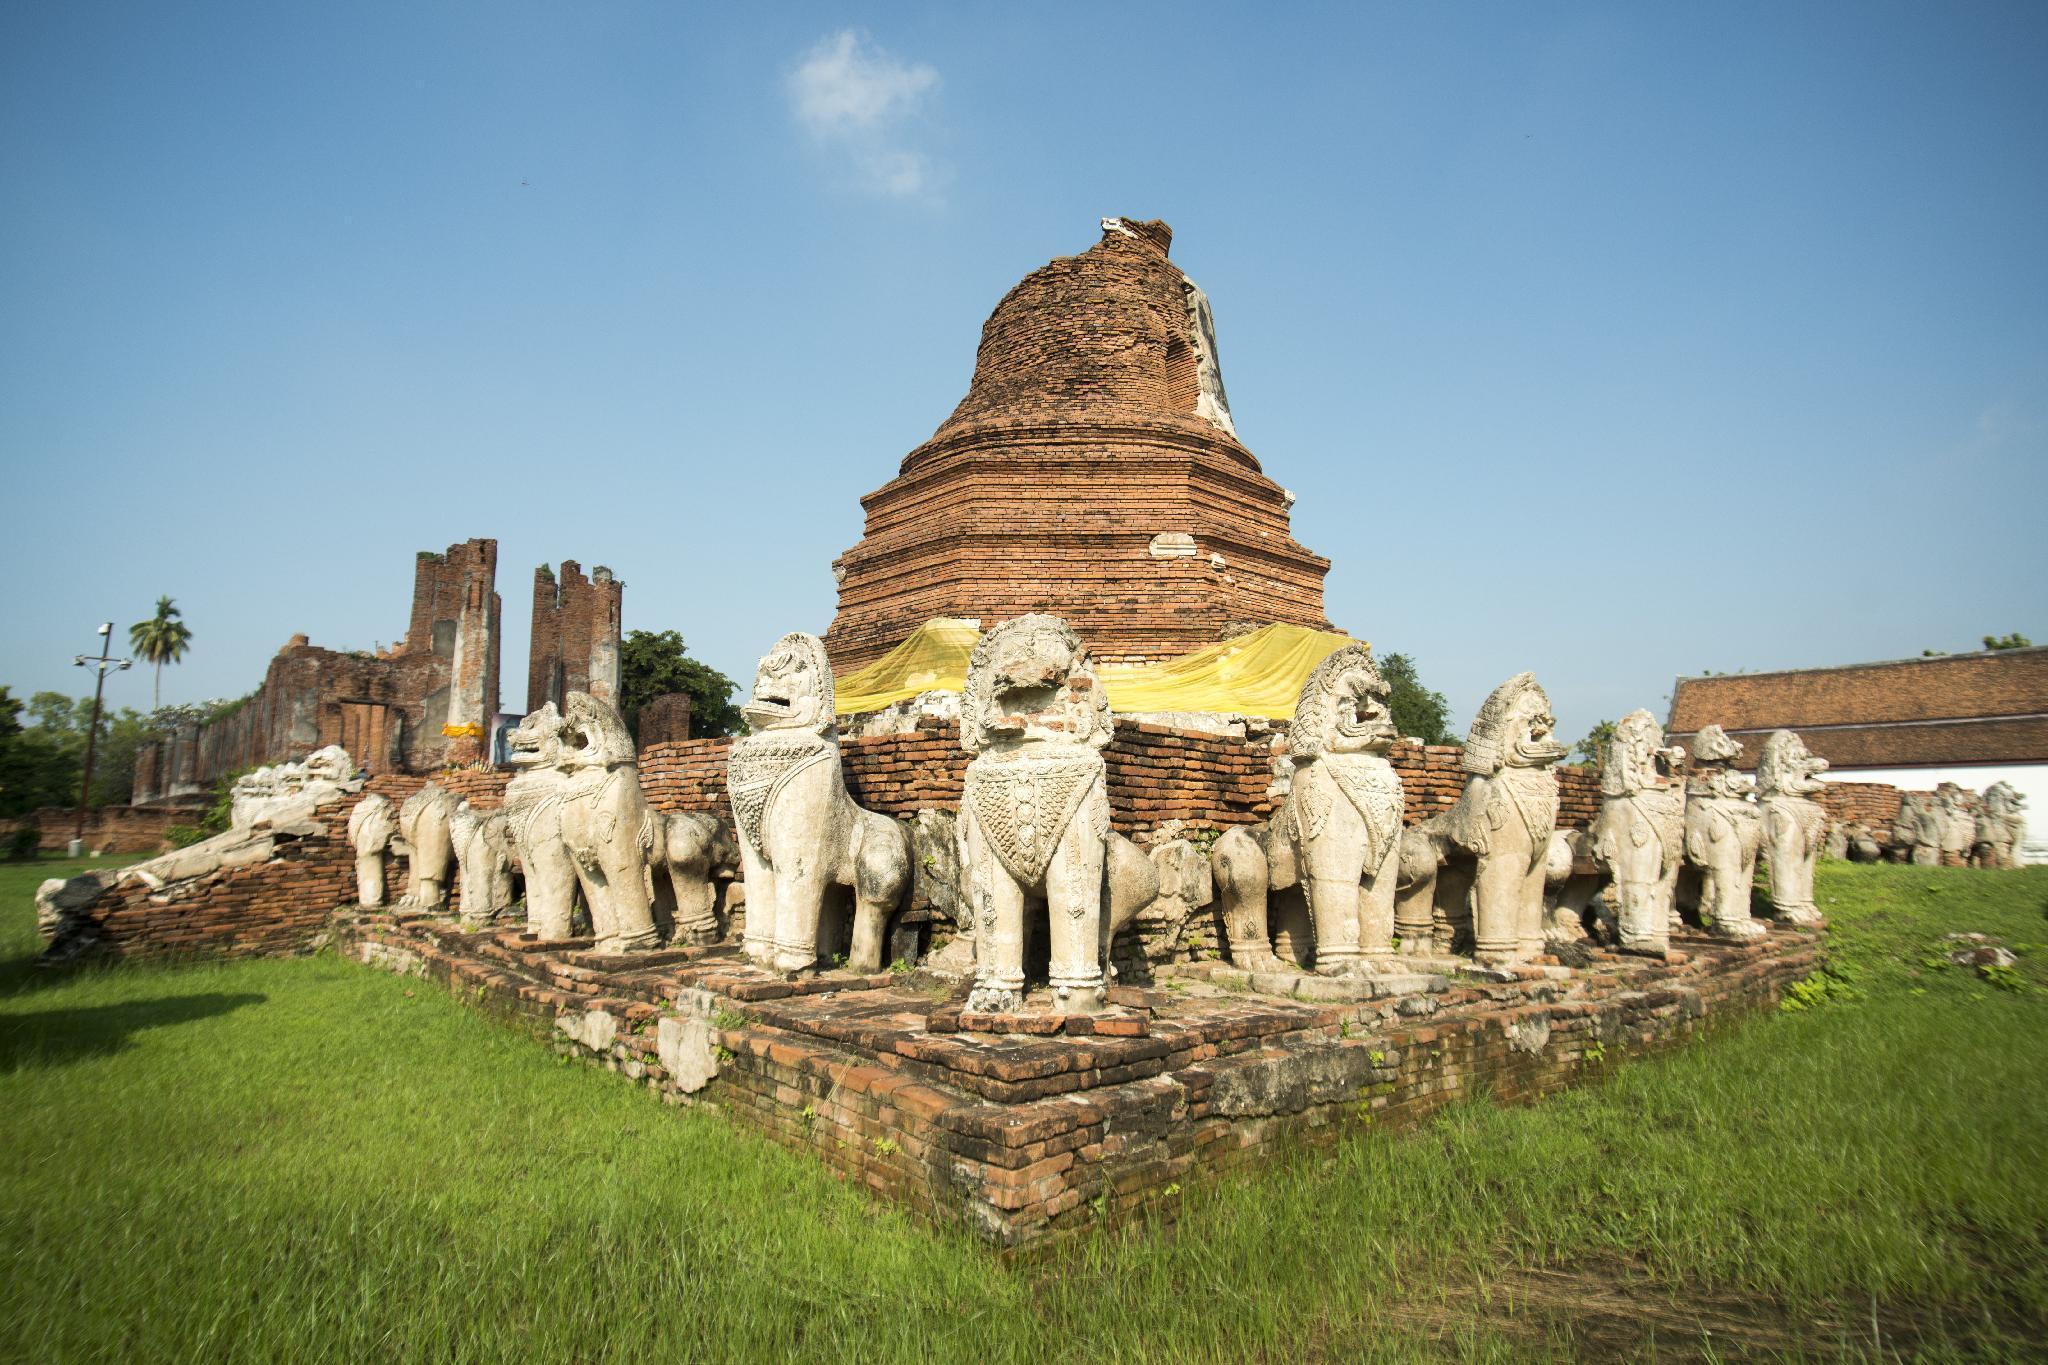 Sunan Place, Phra Nakhon Si Ayutthaya